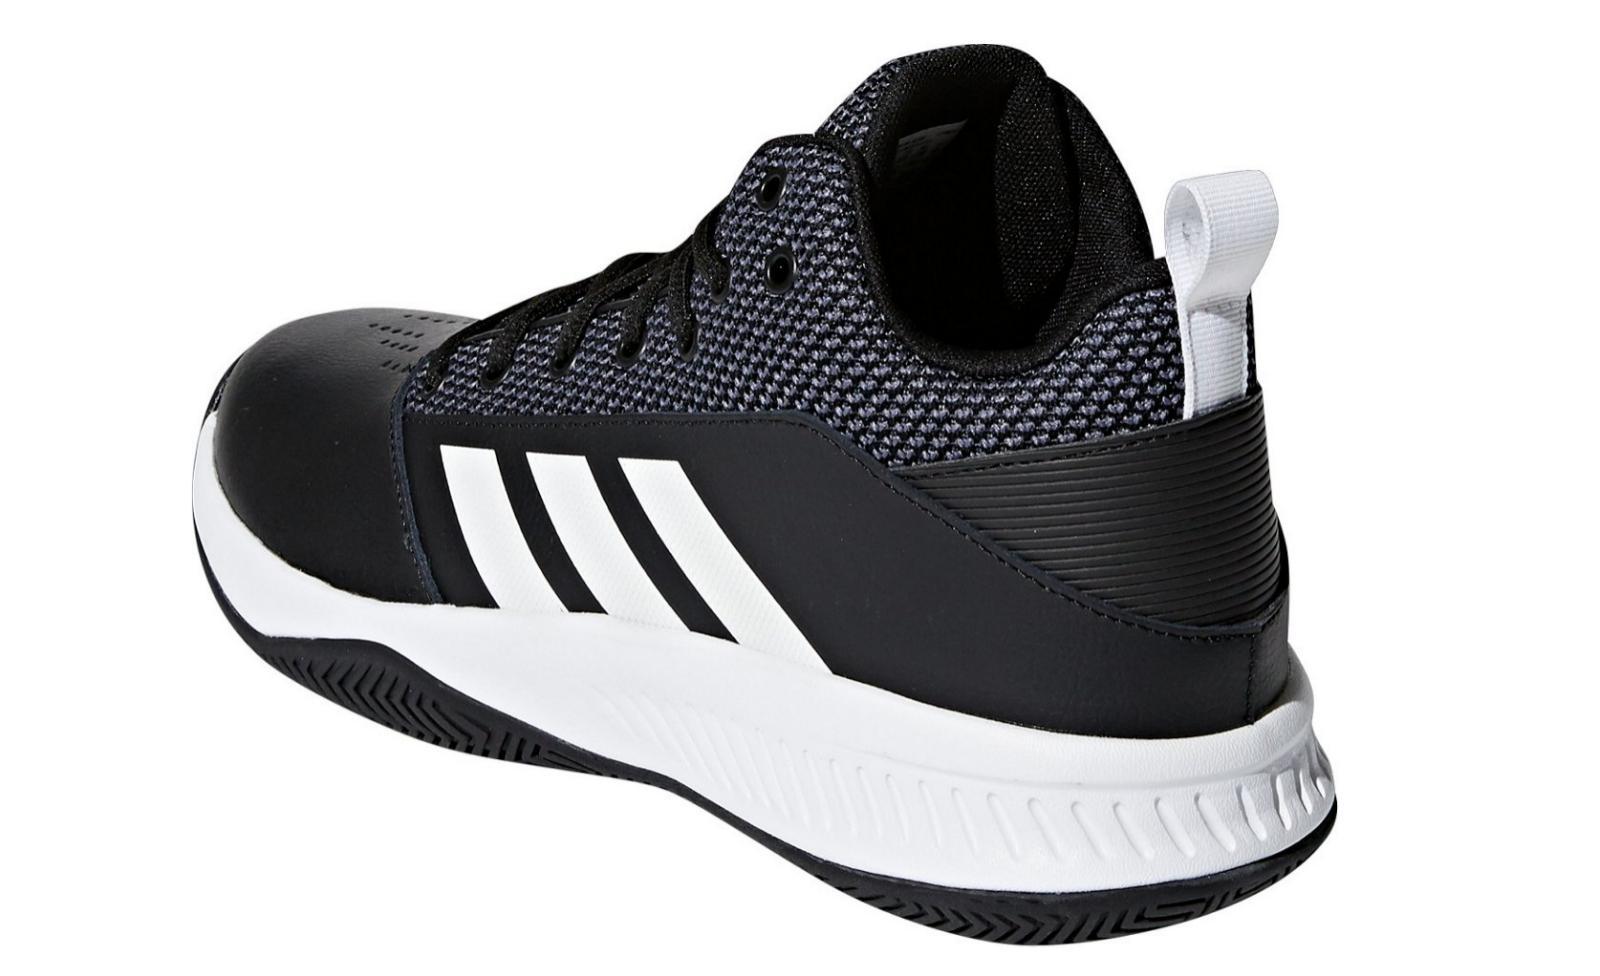 9780ade5c63 Adidas Men s Cloudfoam Ilation 2.0 Basketball Shoes Wide